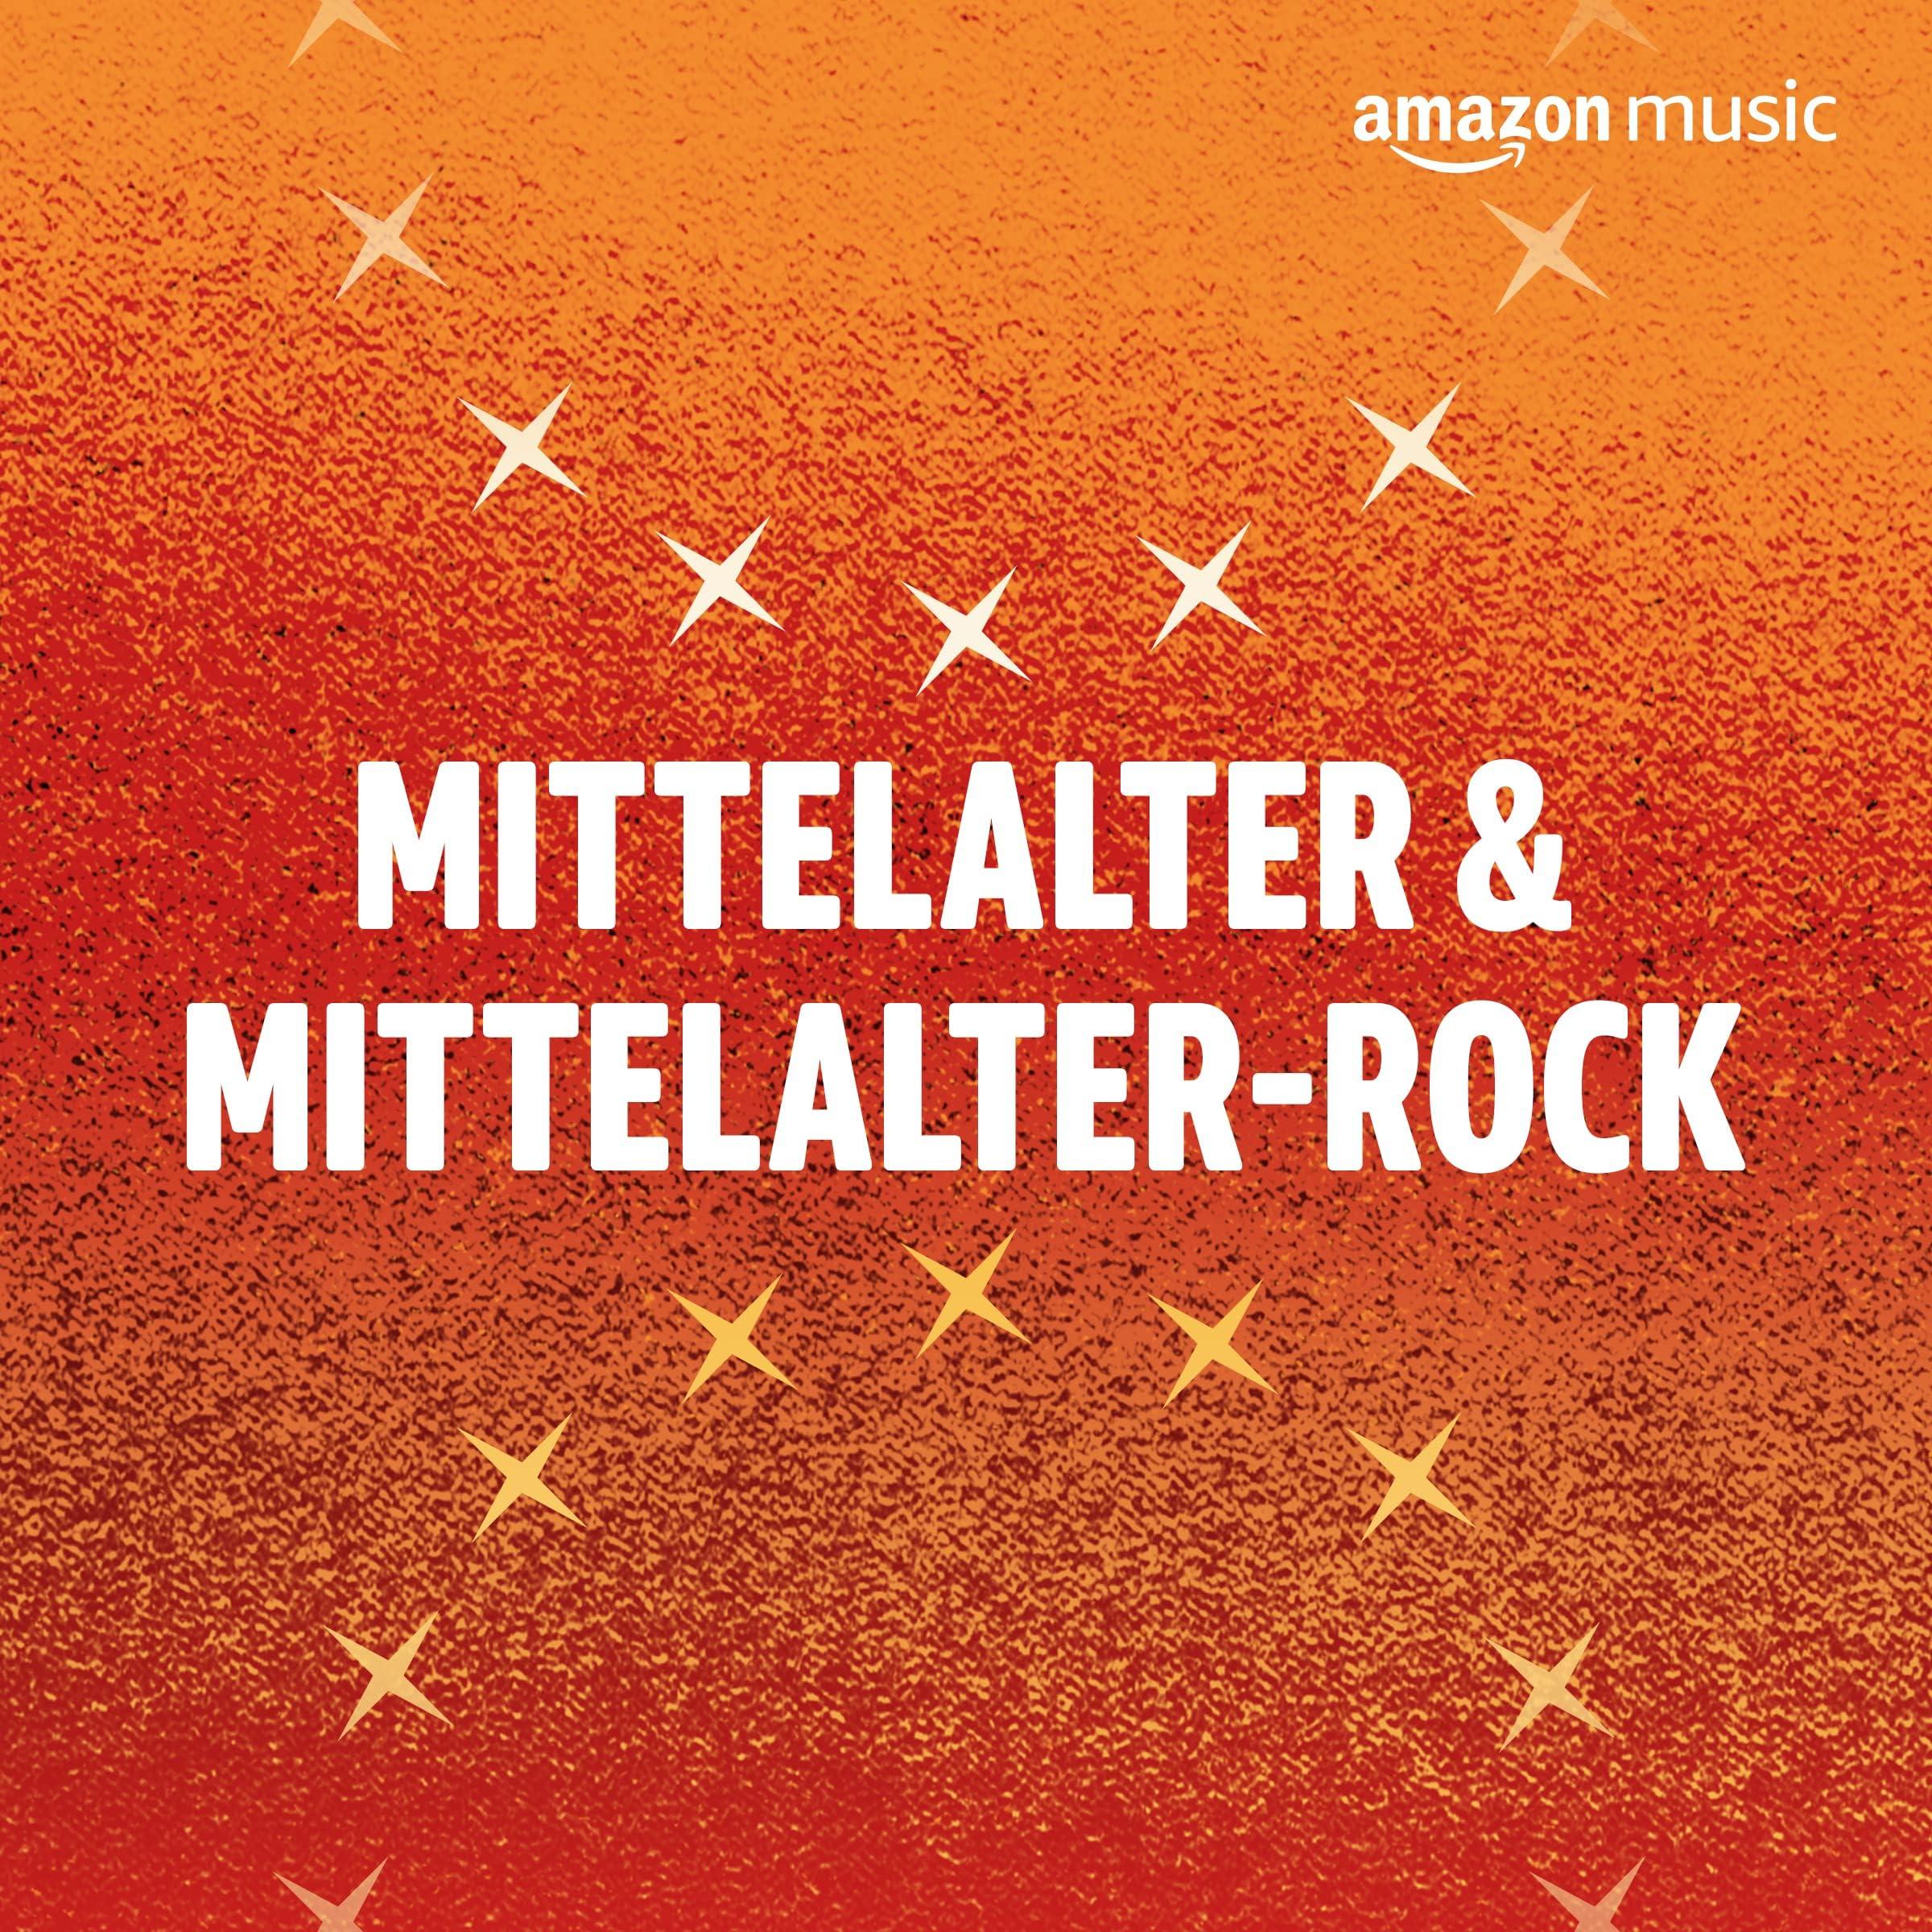 Mittelalter & Mittelalter-Rock